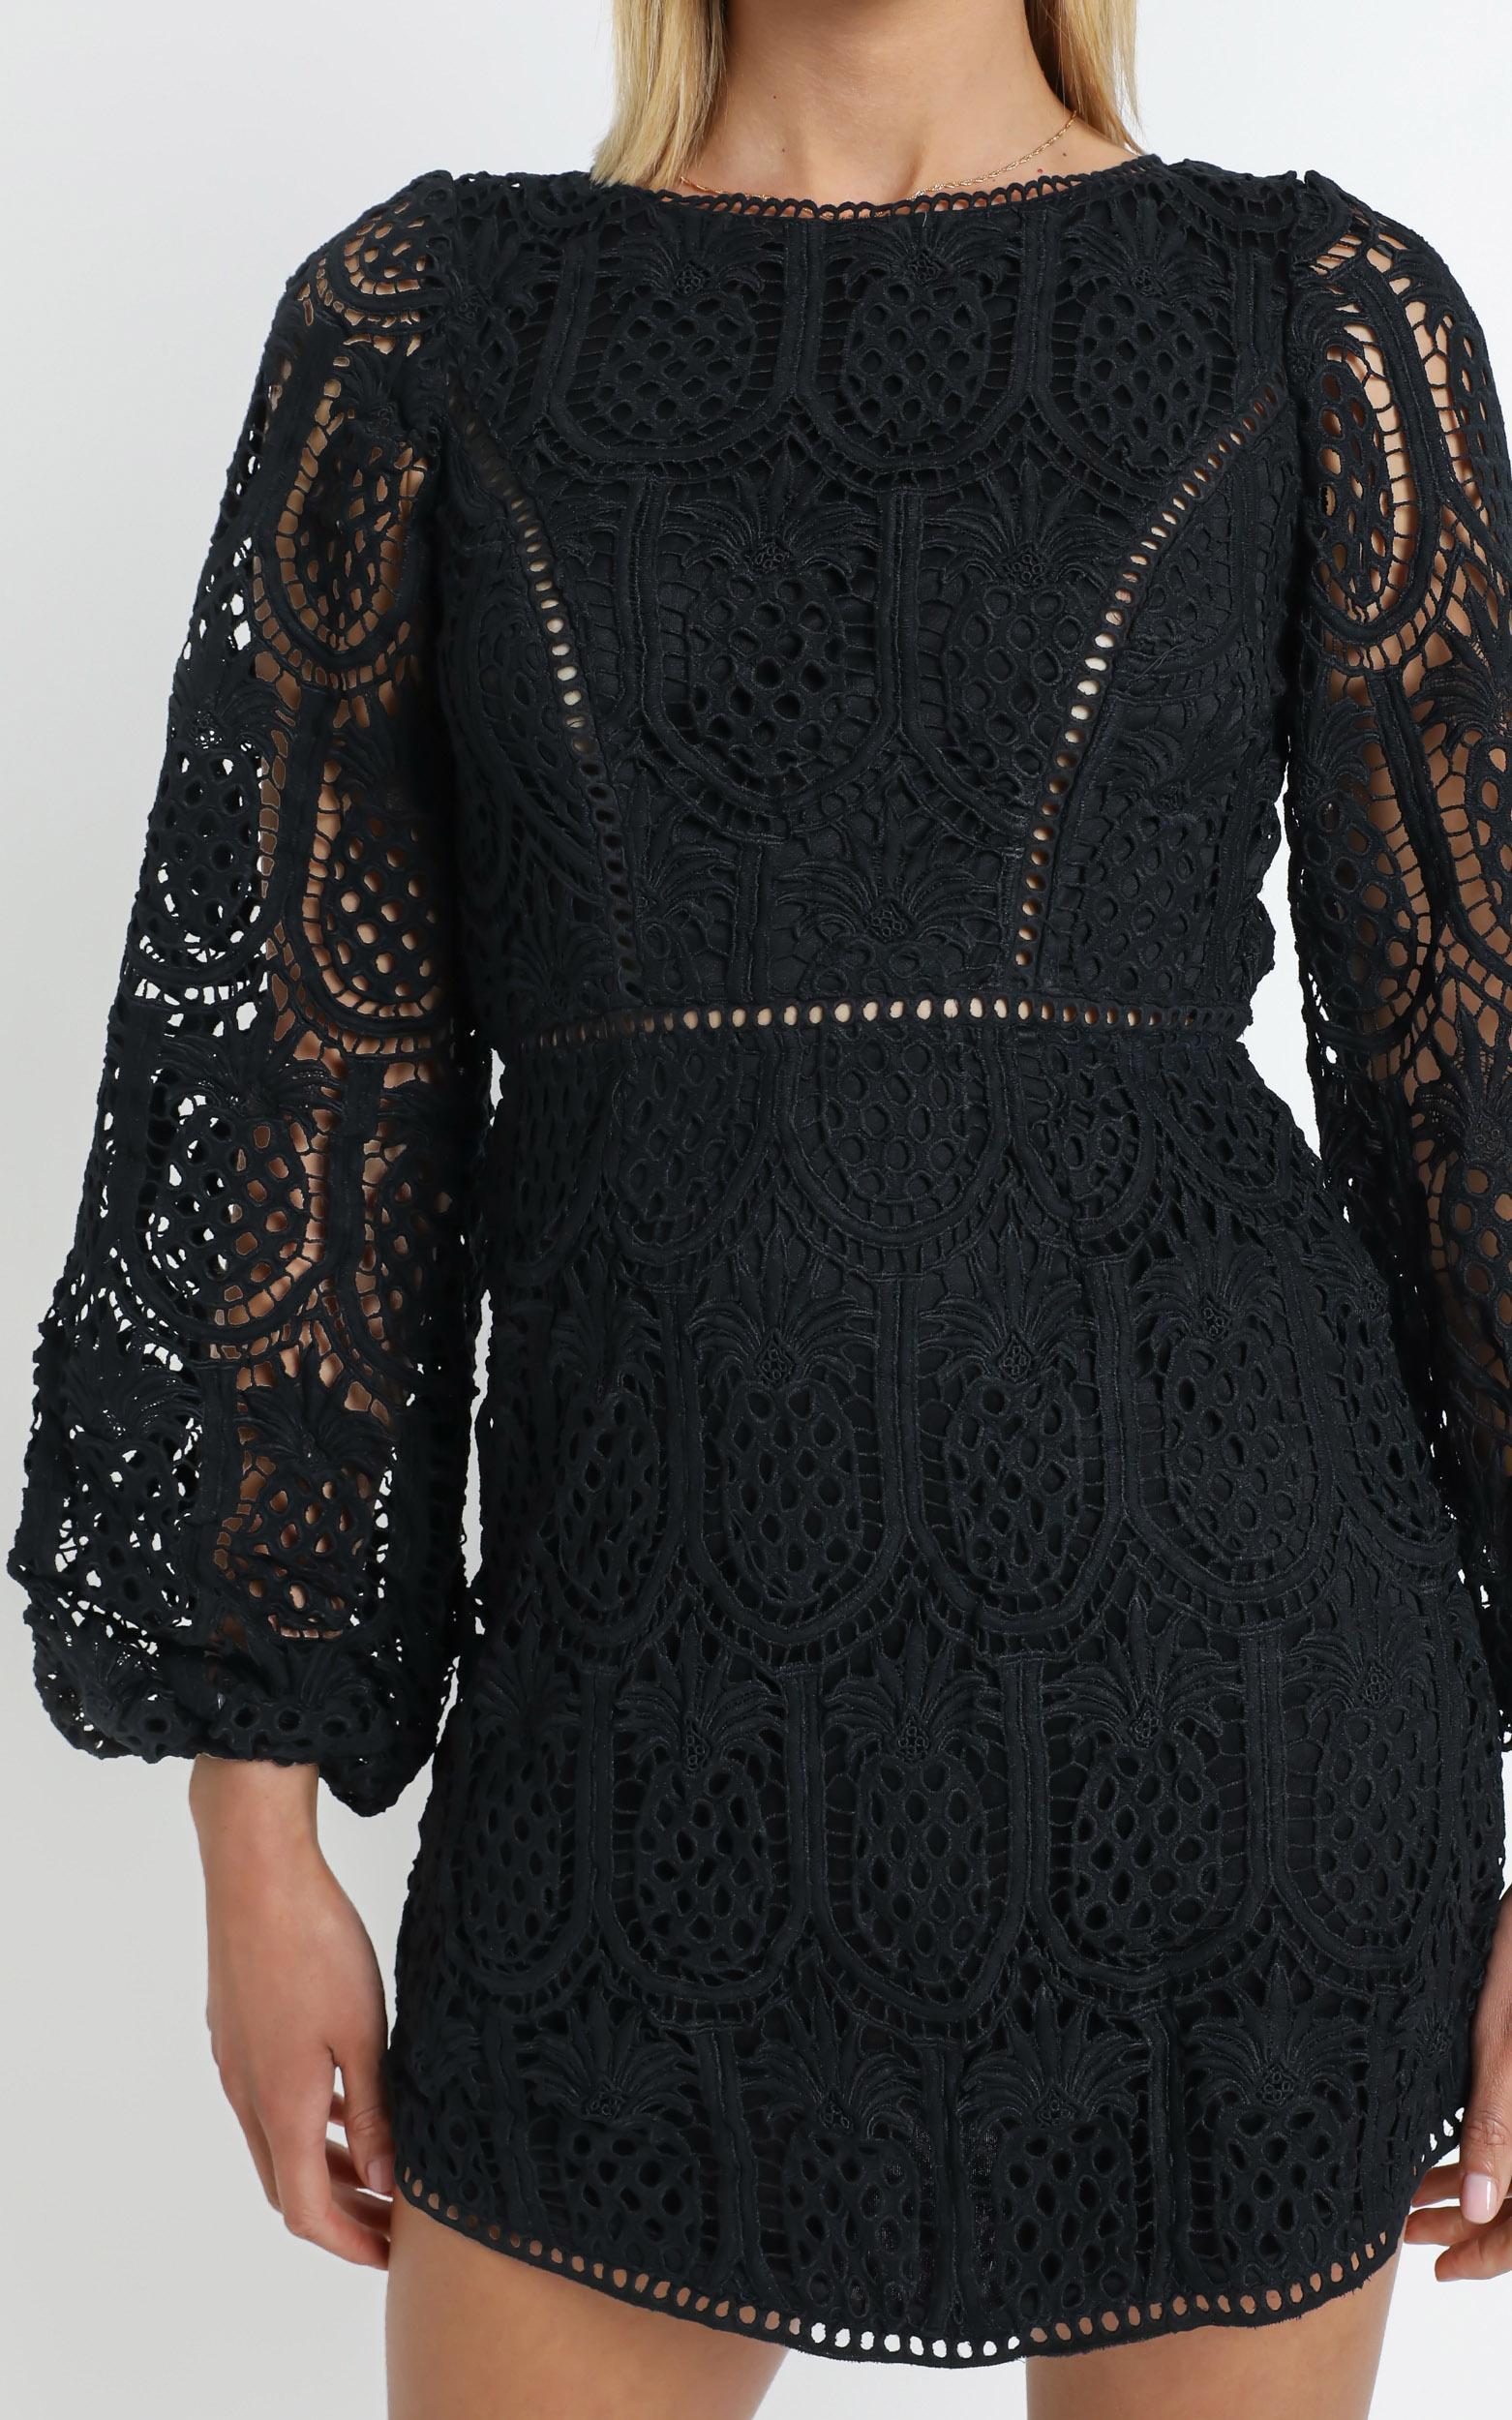 Adeena Dress in Black - 12 (L), Black, hi-res image number null